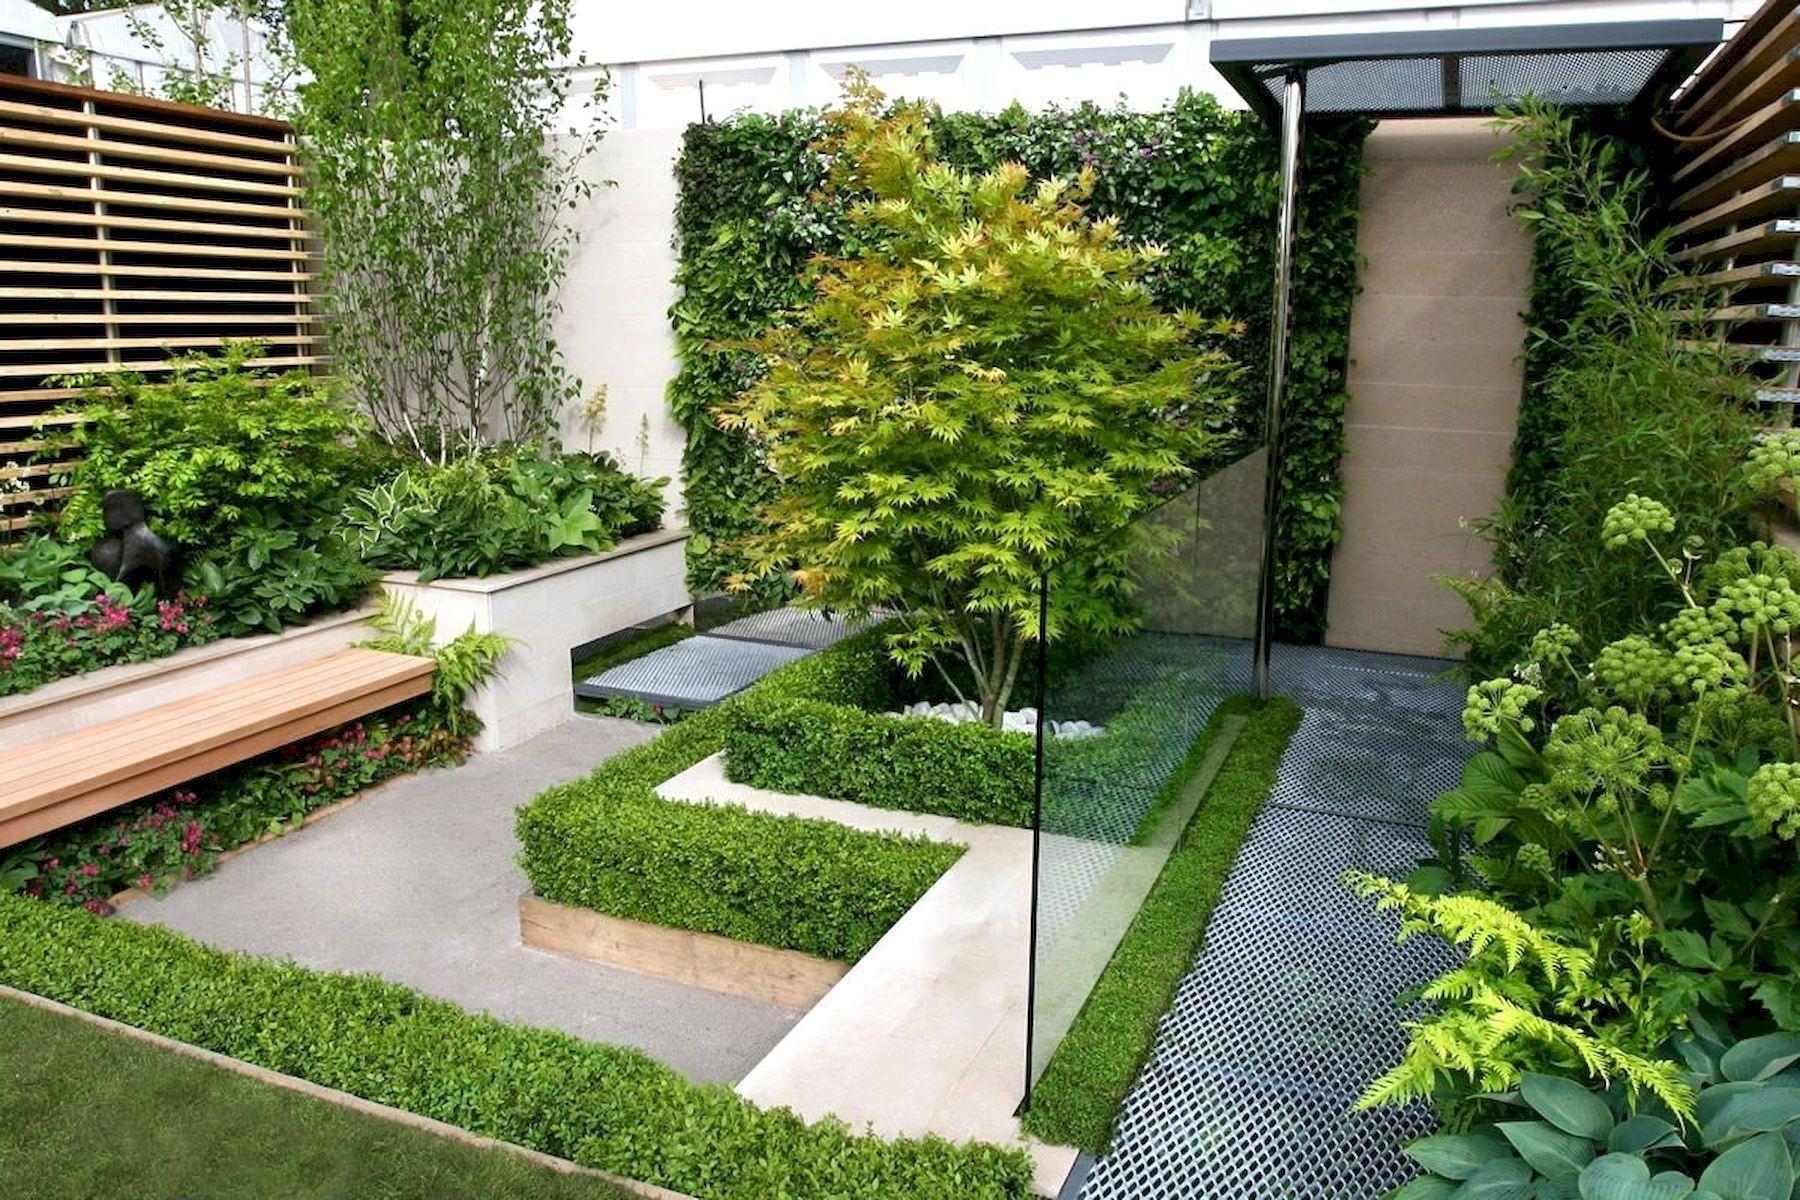 49 Minimalist Garden For Backyard Ideas Minimalist Garden Modern Garden Design Modern Garden